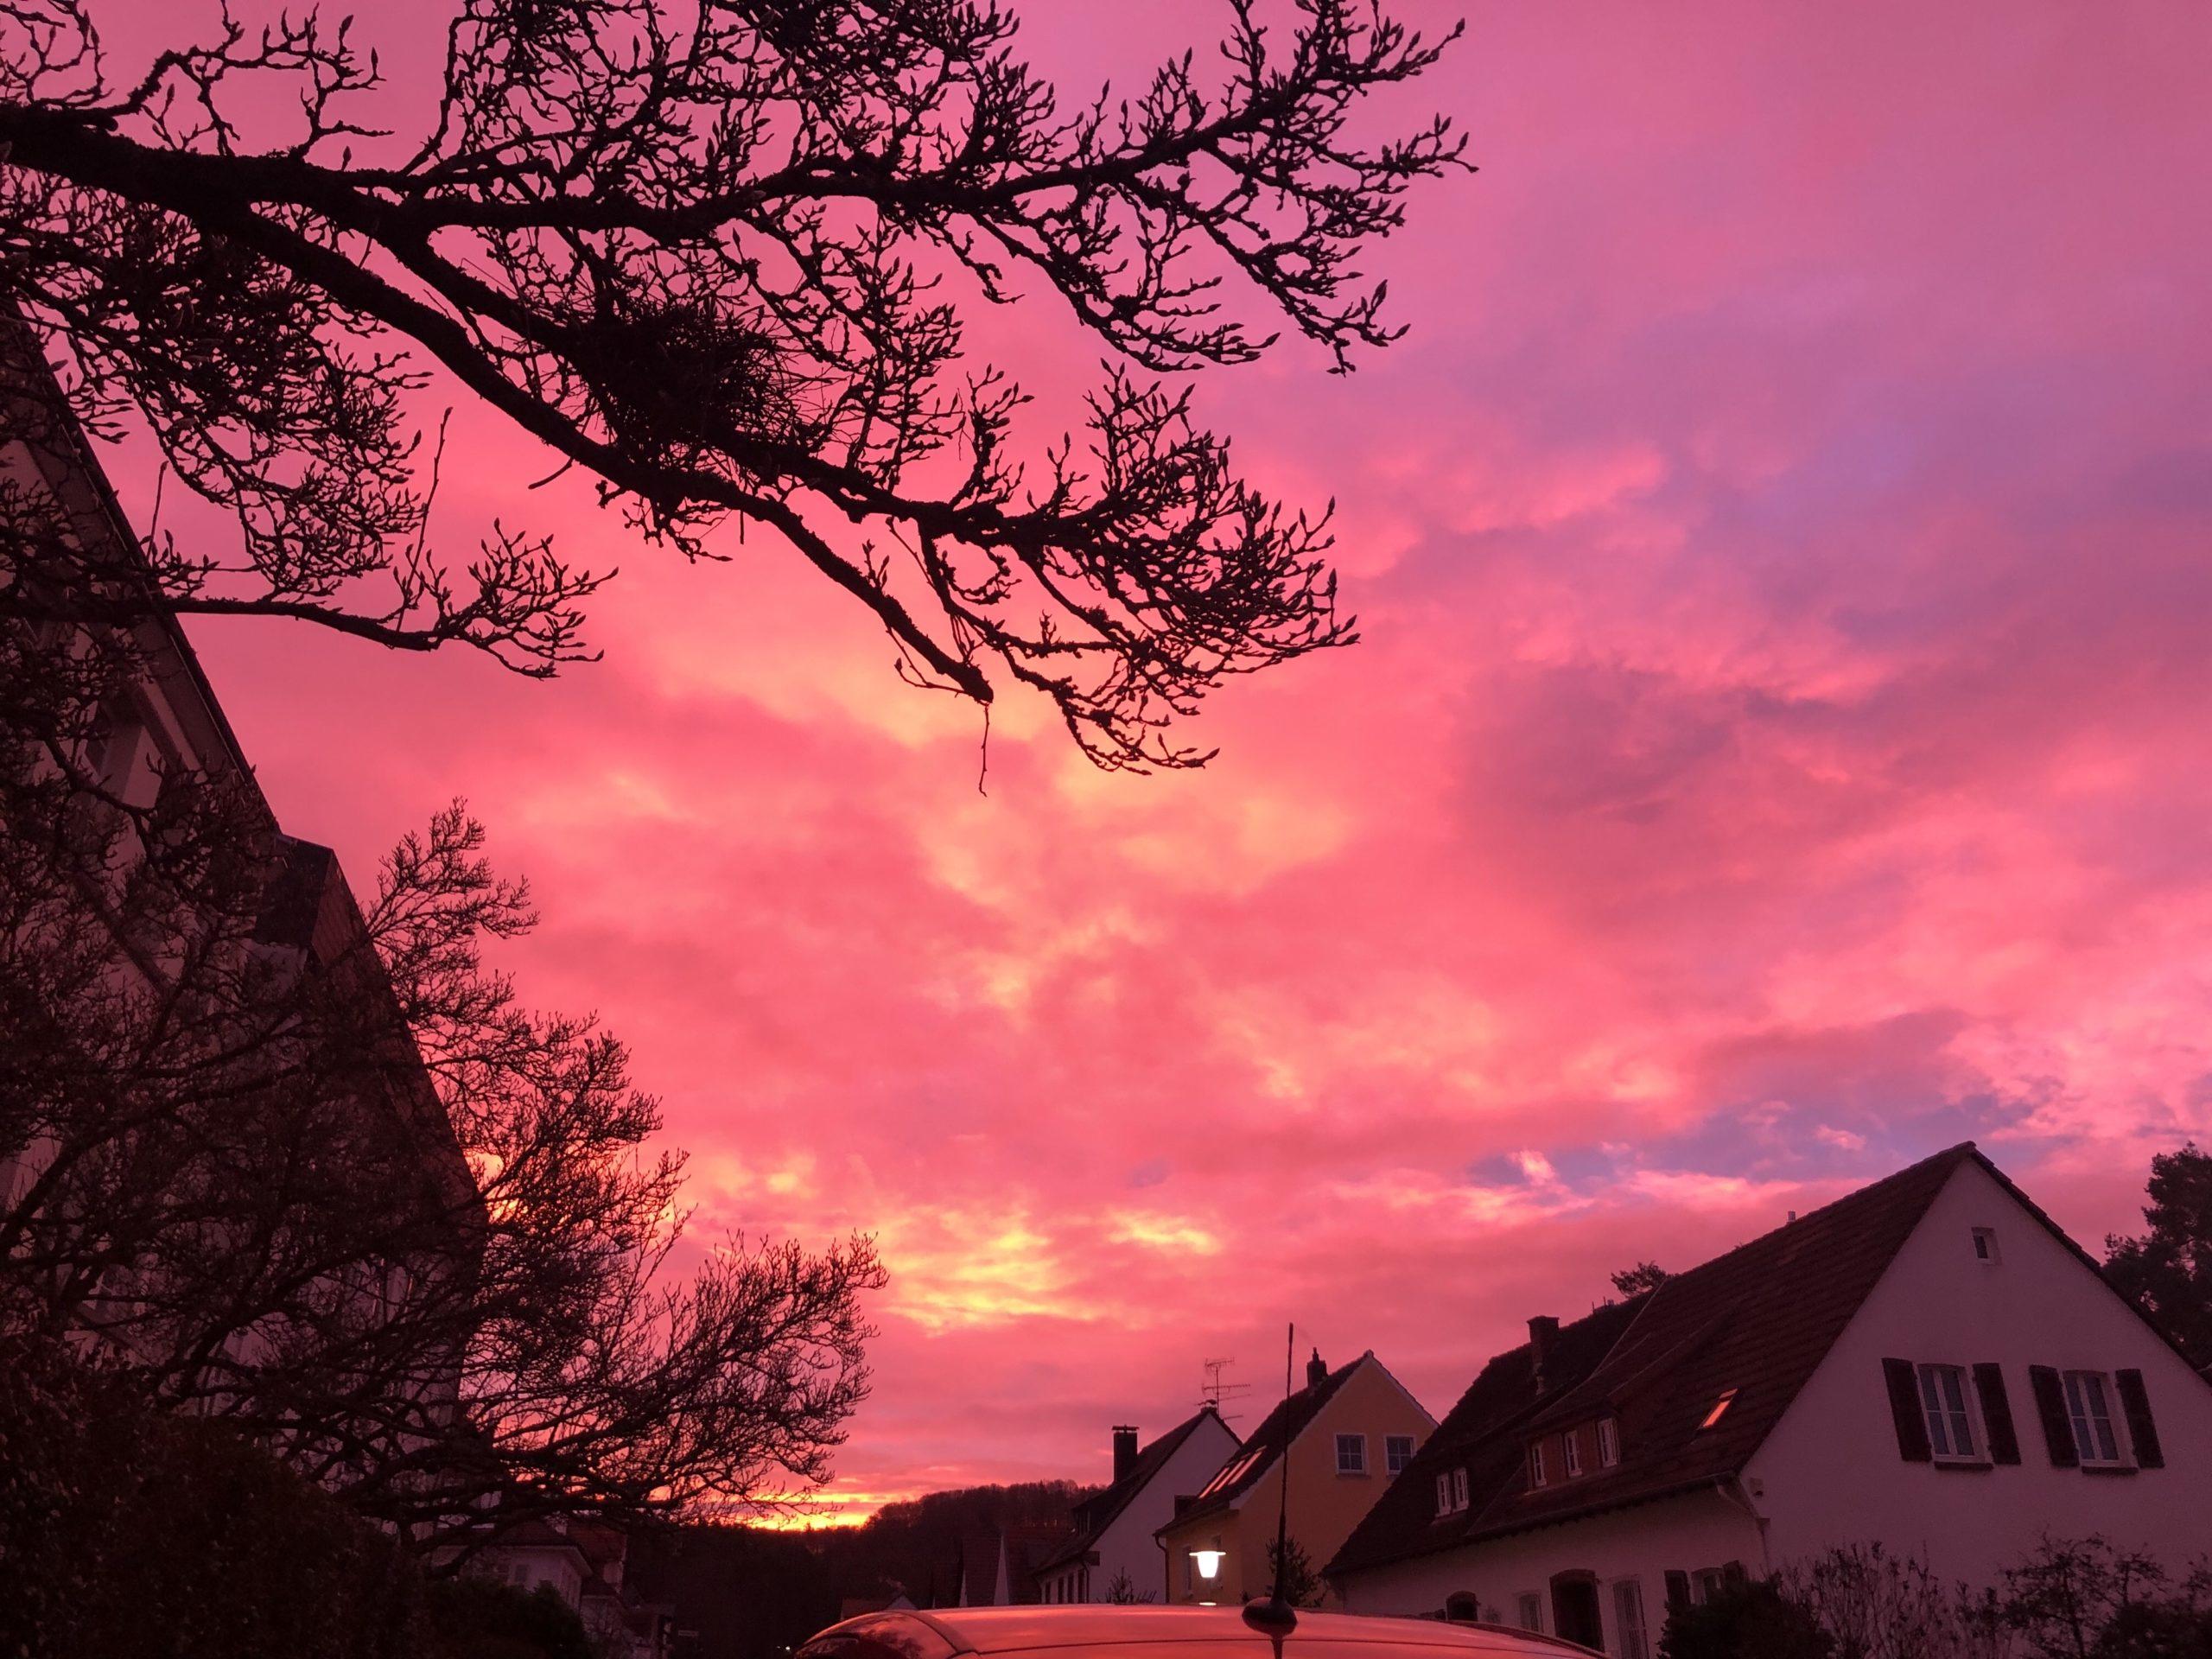 Pink strahlender Himmel vom kräftigen Sonnenaufgang gefärbt